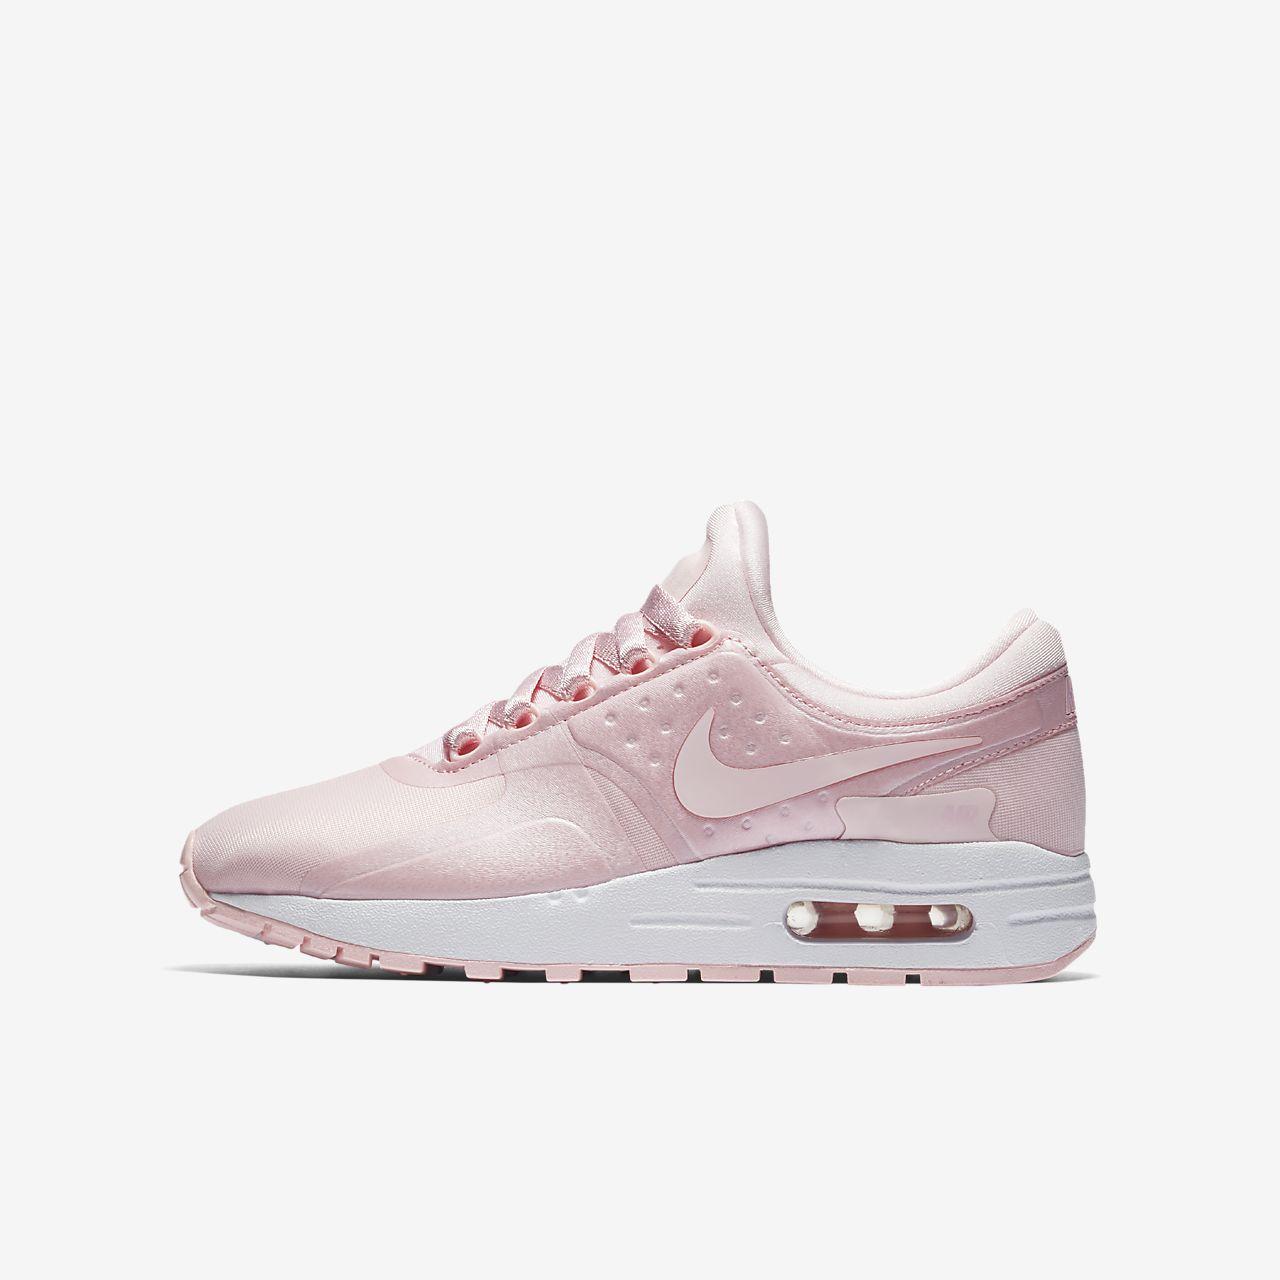 quality design 0616e d4105 Nike Air Max Zero SE Big Kids Shoe .